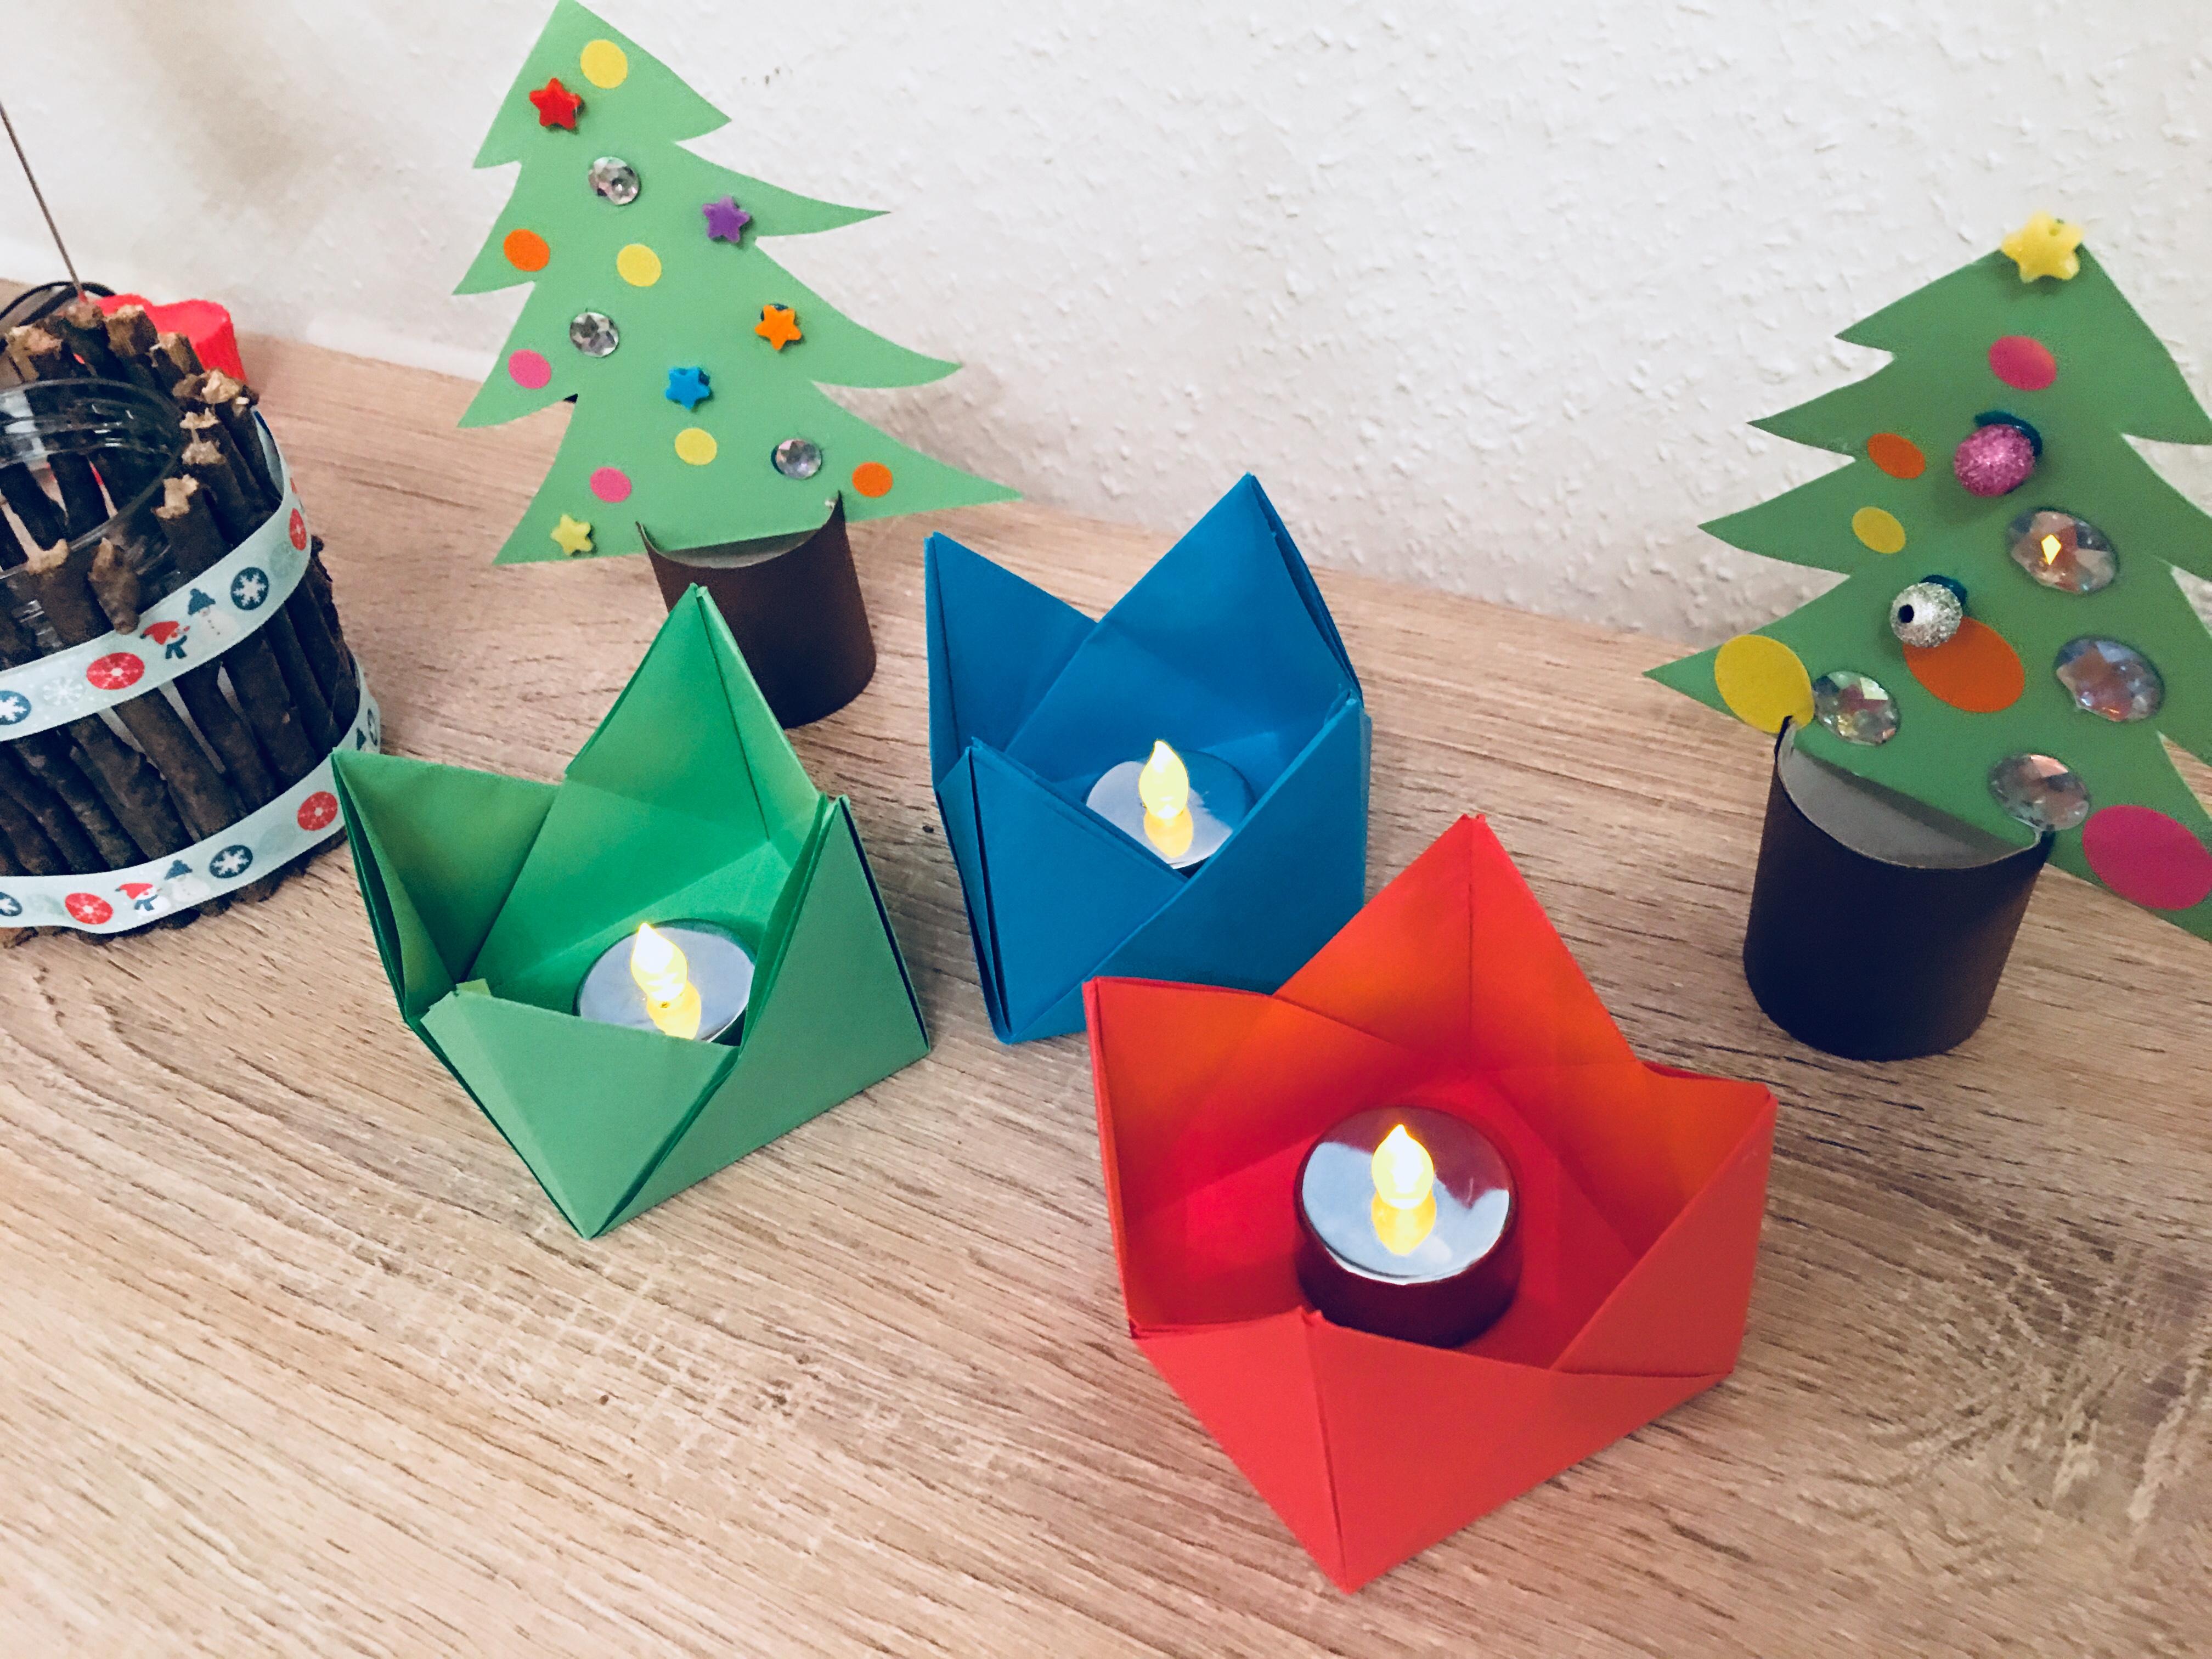 teelichthalter aus origami basteln mit kindern der familienblog f r kreative eltern. Black Bedroom Furniture Sets. Home Design Ideas